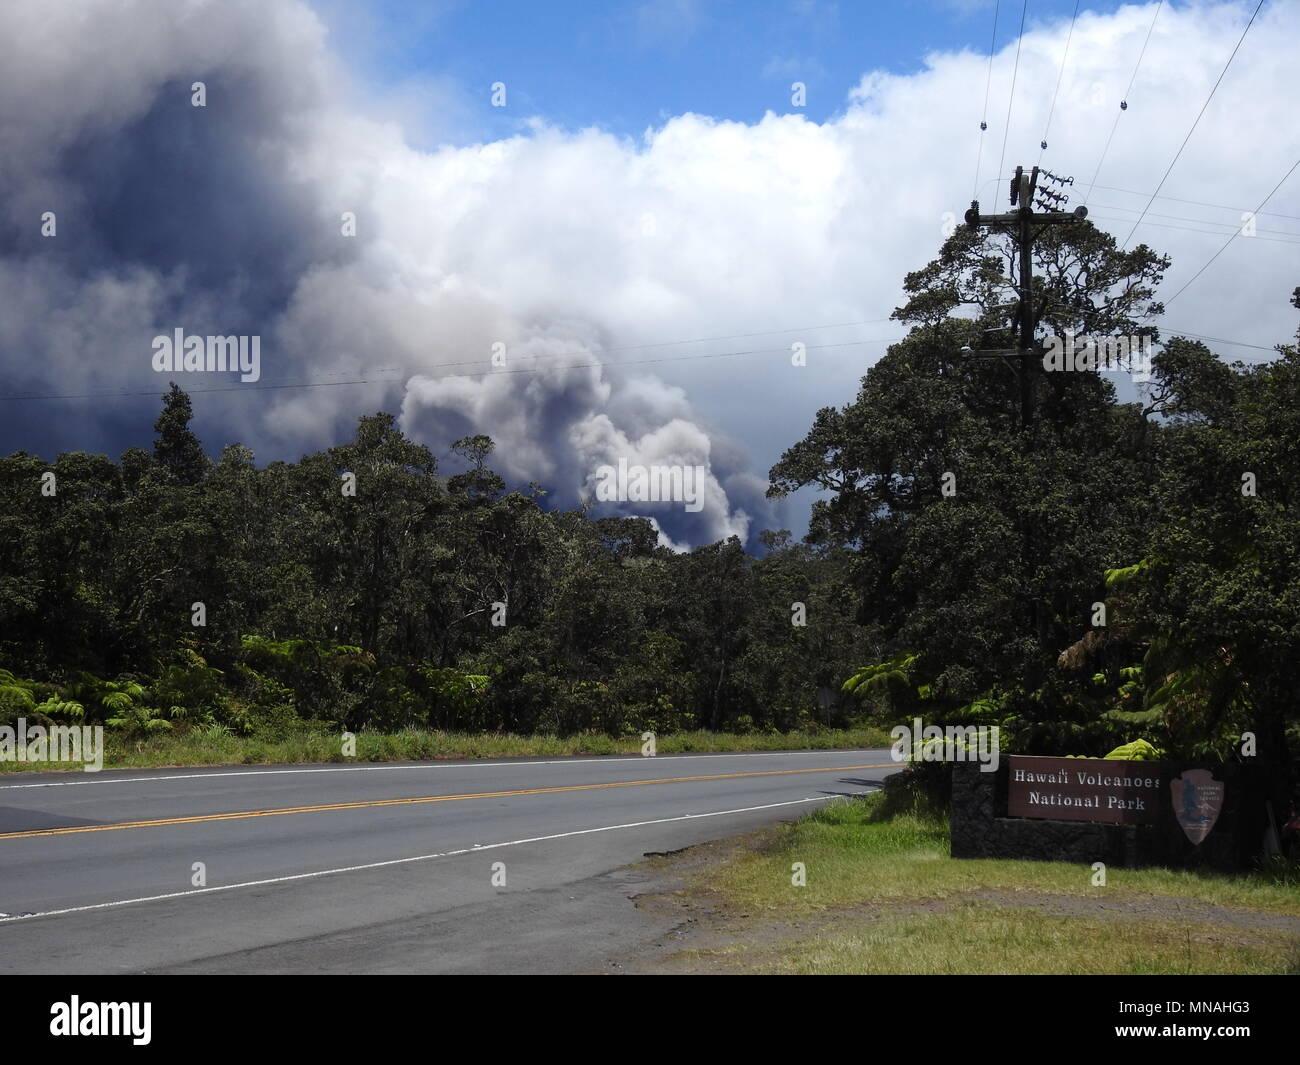 Kilauea Volcano, Hawaii. 15th May 2018. Ash Plume from Kilauea Volcano Hawaii today (05/15/2018 HST) or 05/16/2018 Credit: Volcano Resident/Alamy Live News Stock Photo